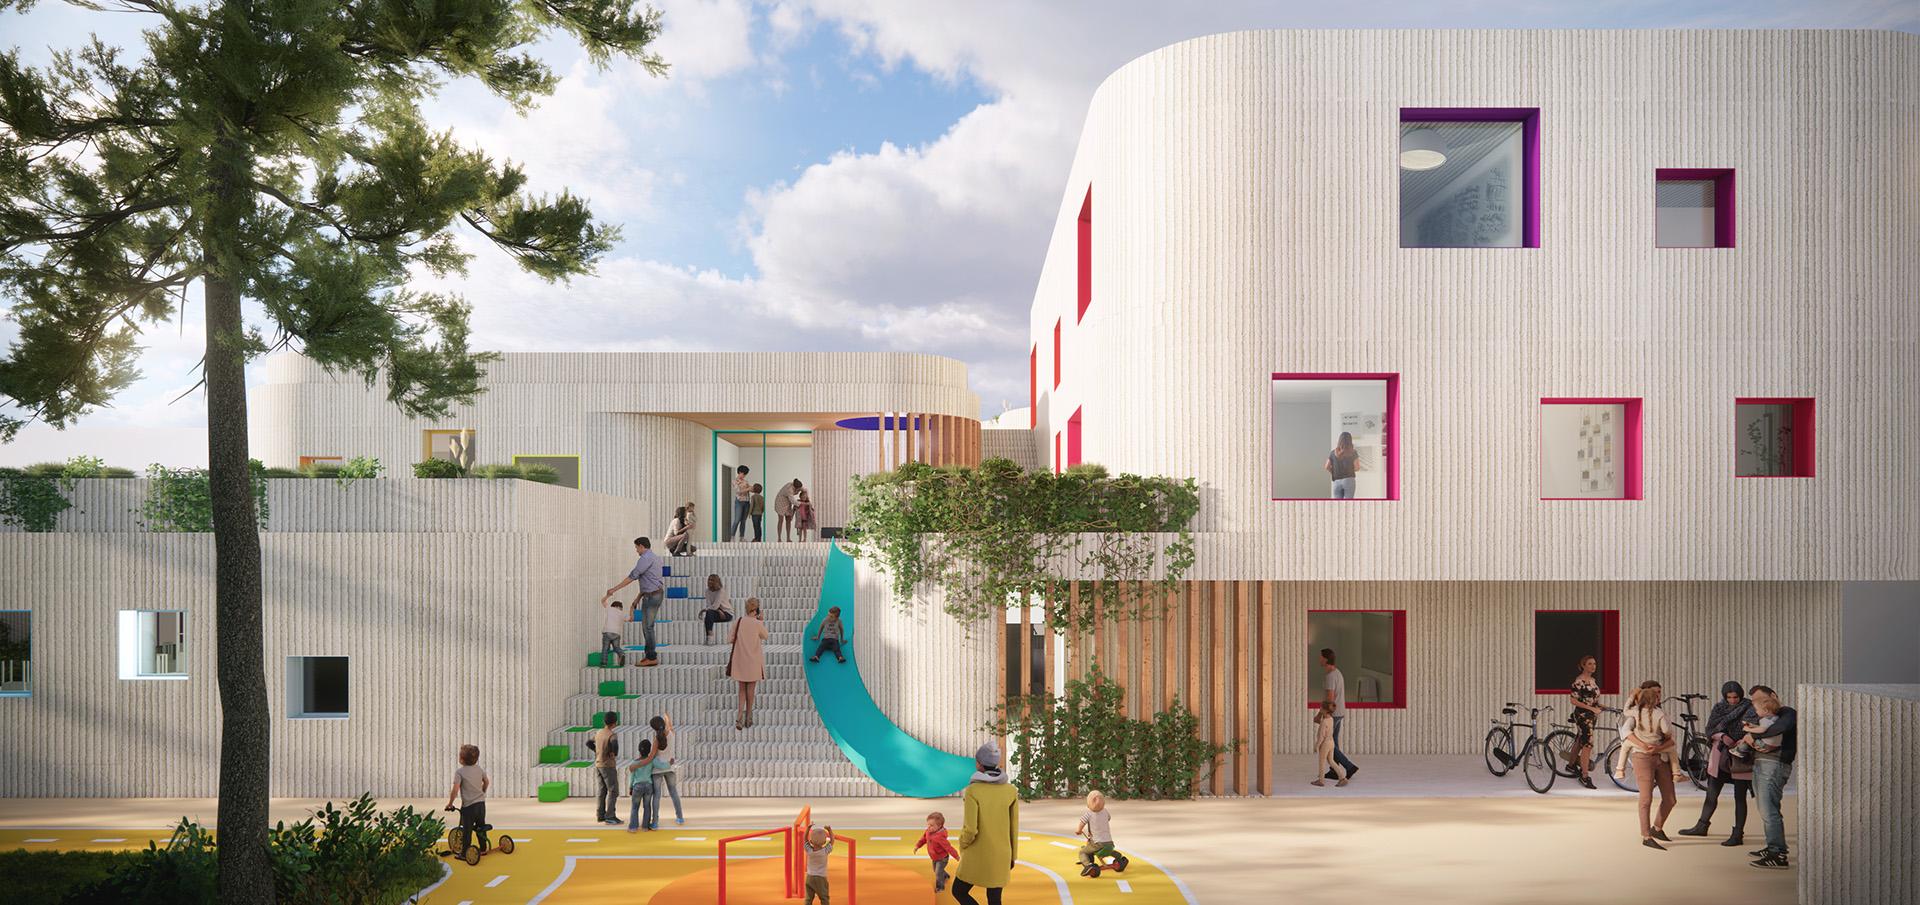 sastudio Tiago Sá architecture iceland kindergarten purchased husavik award mention arquitetura